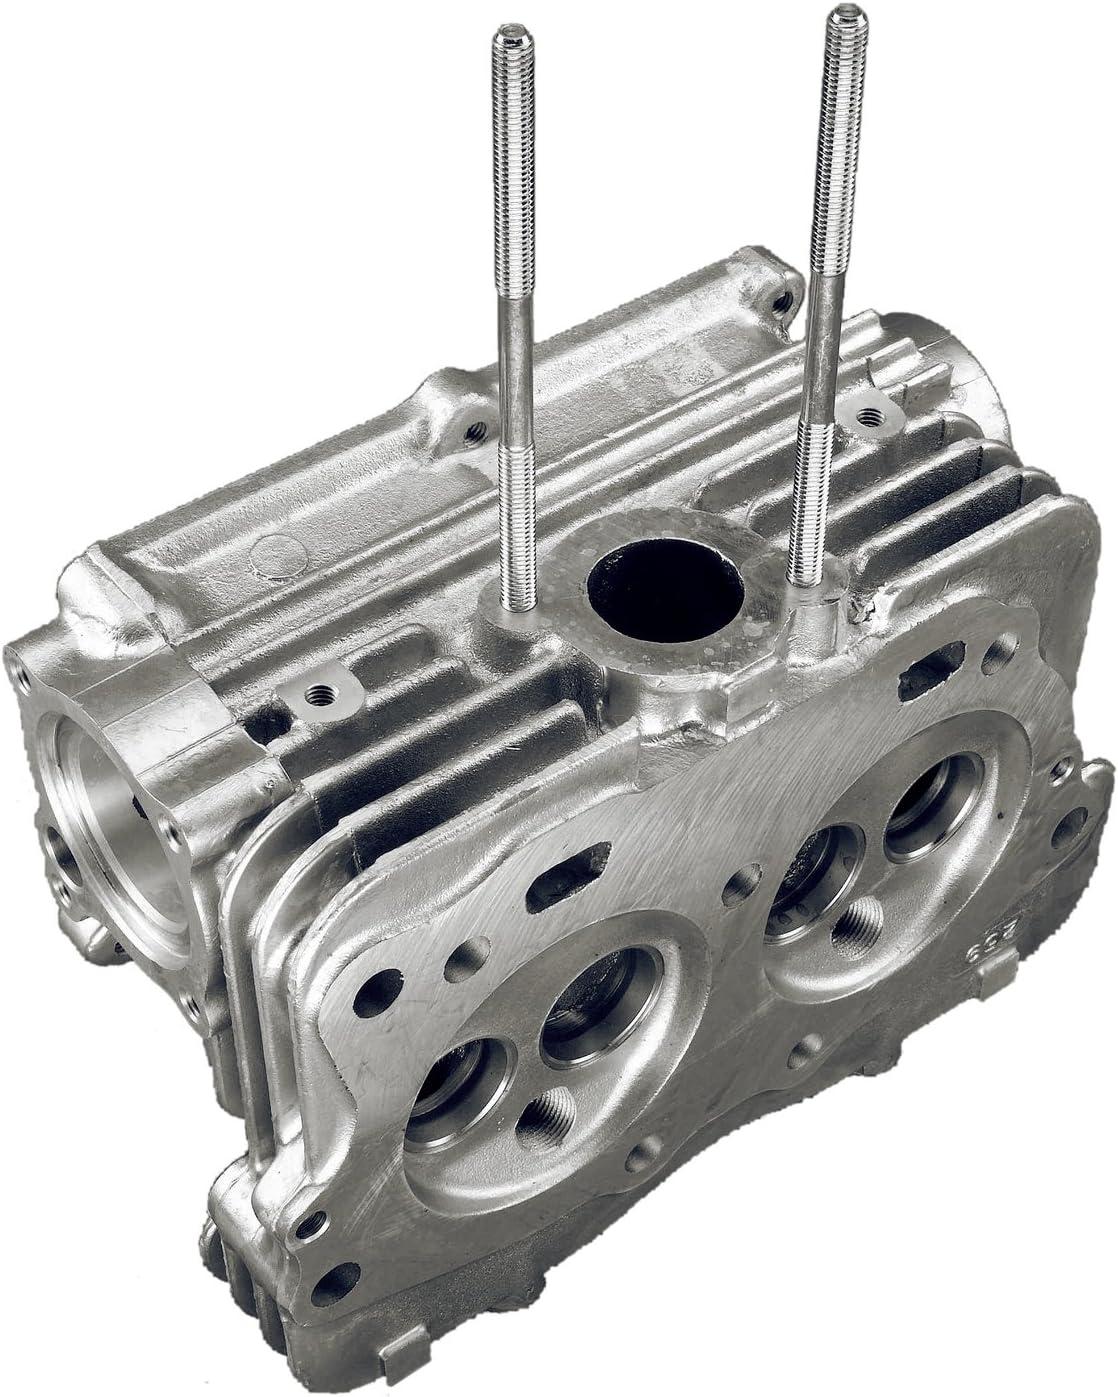 EZGO 72391G01 Cylinder Head for 350cc Engine Motorcycle & ATV ...